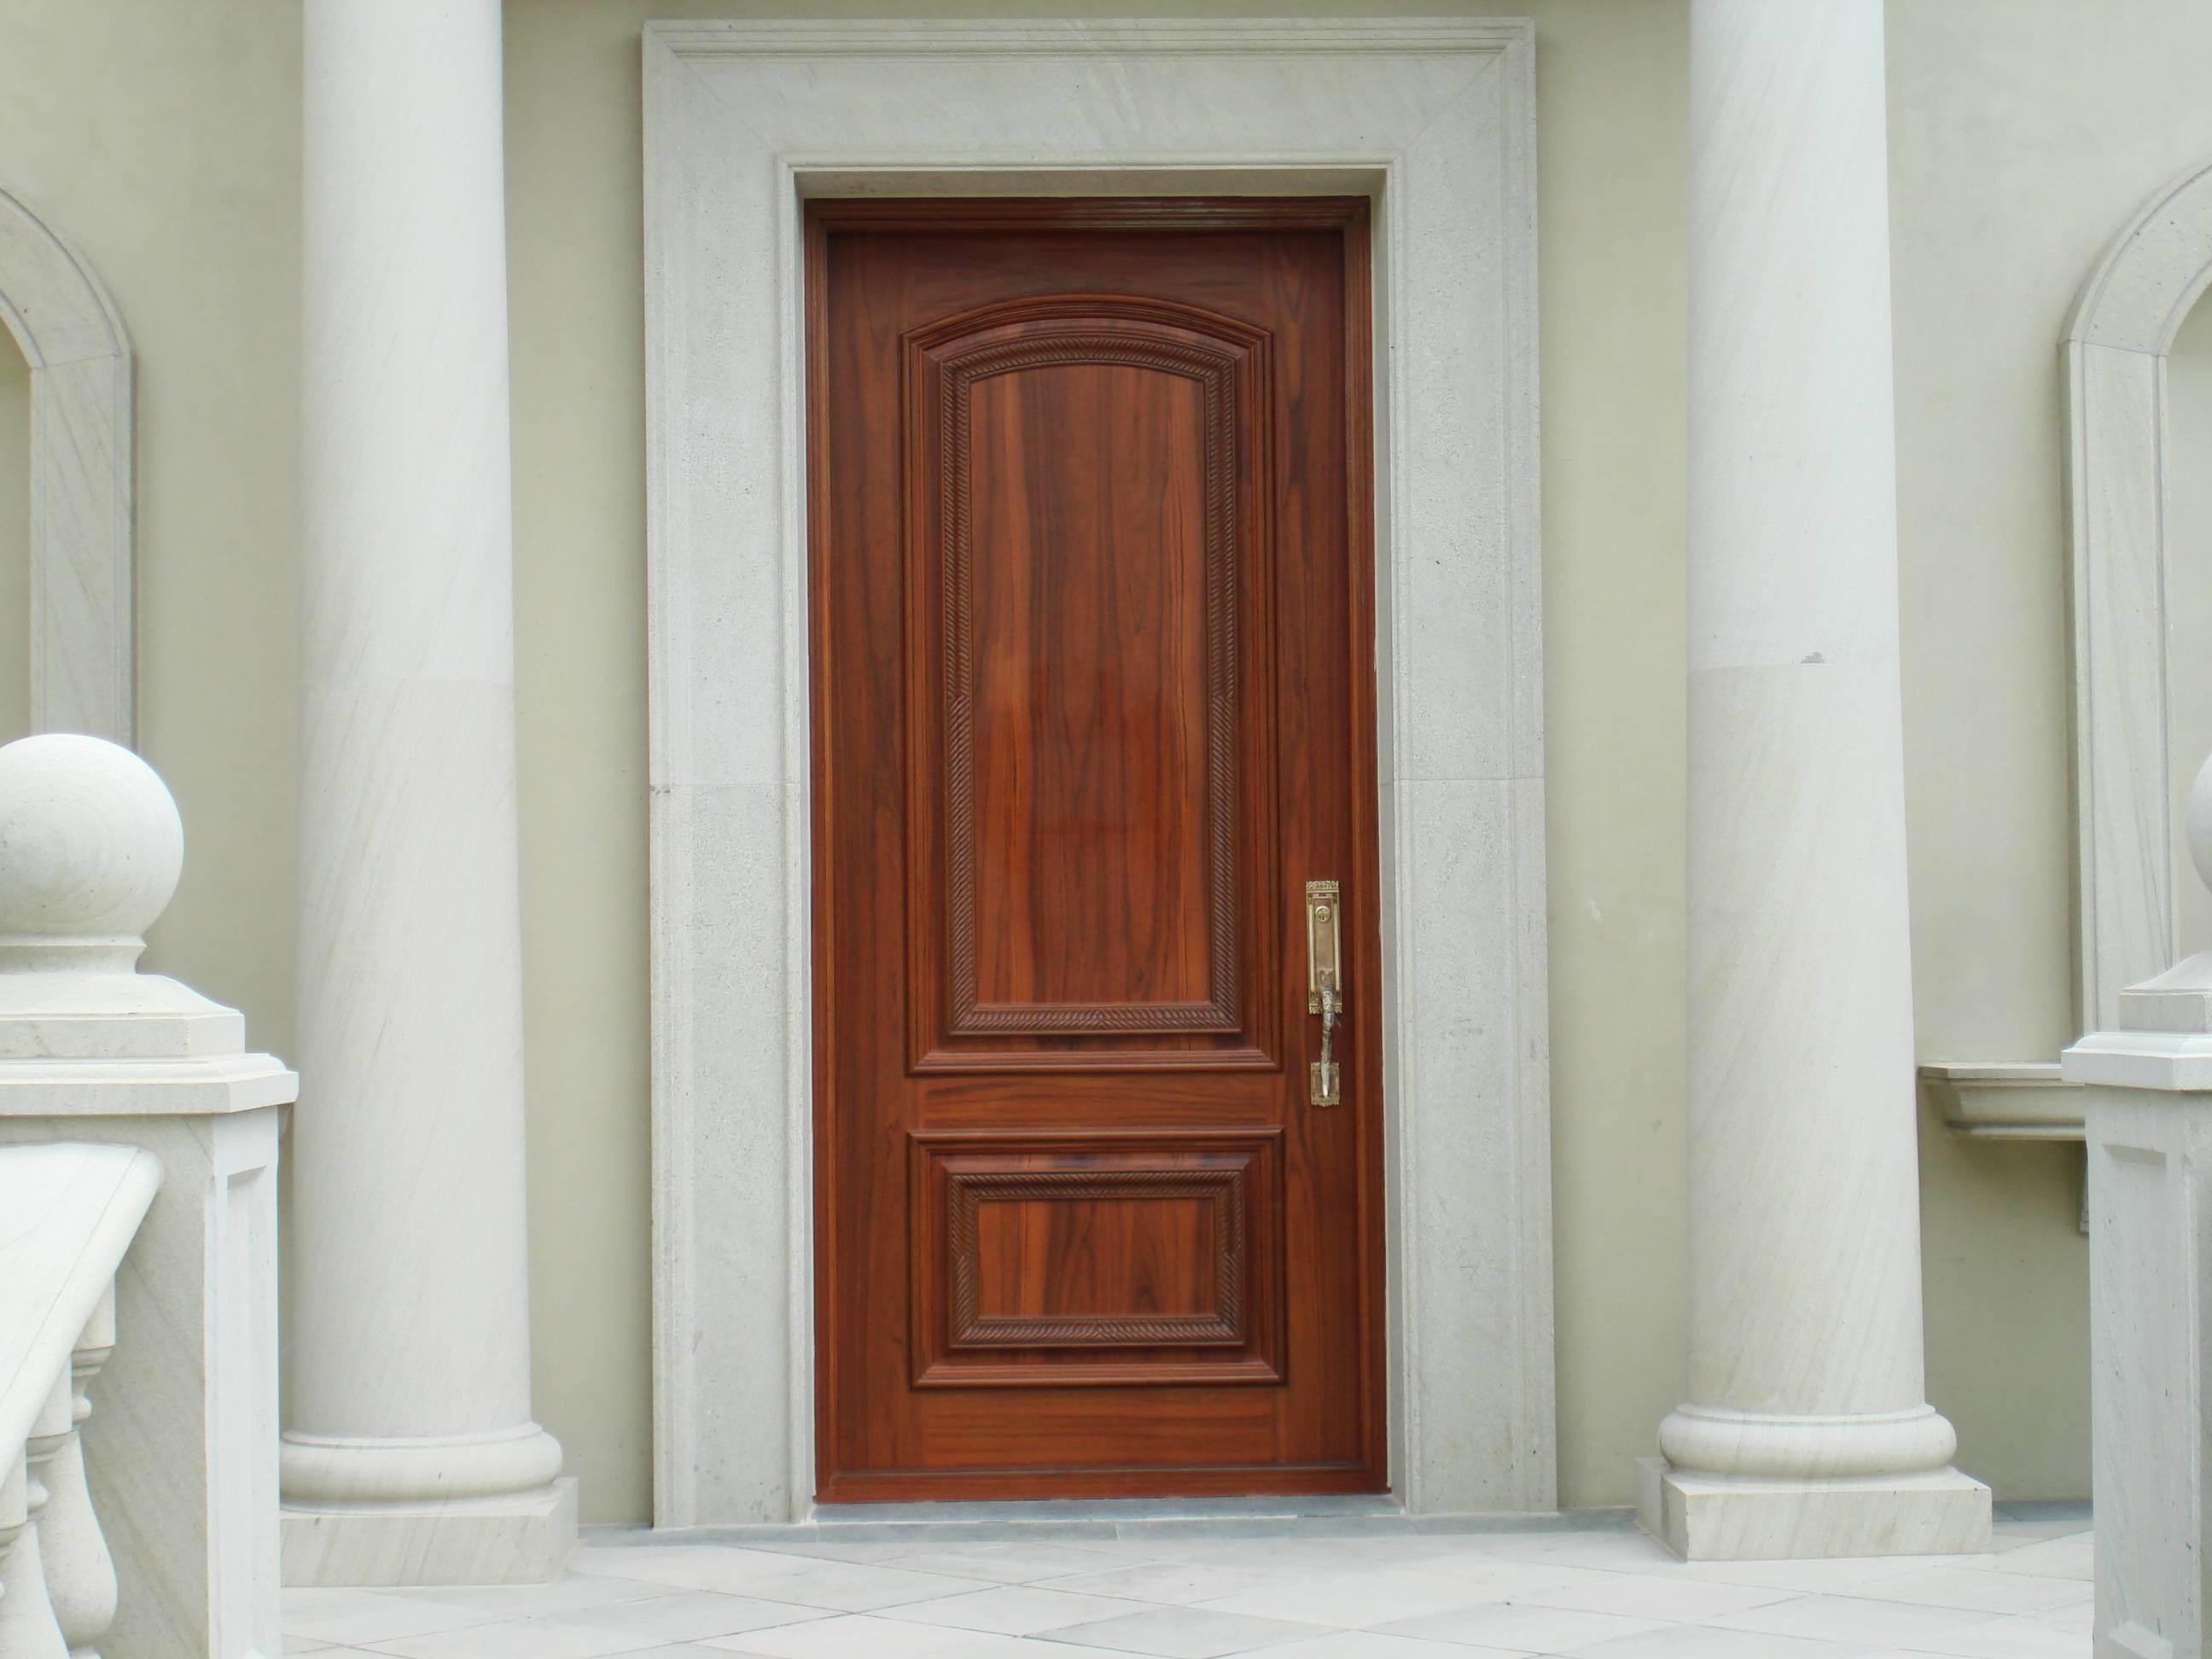 Puerta de madera de la entrada puerta de madera de la for Puertas entrada madera maciza precios